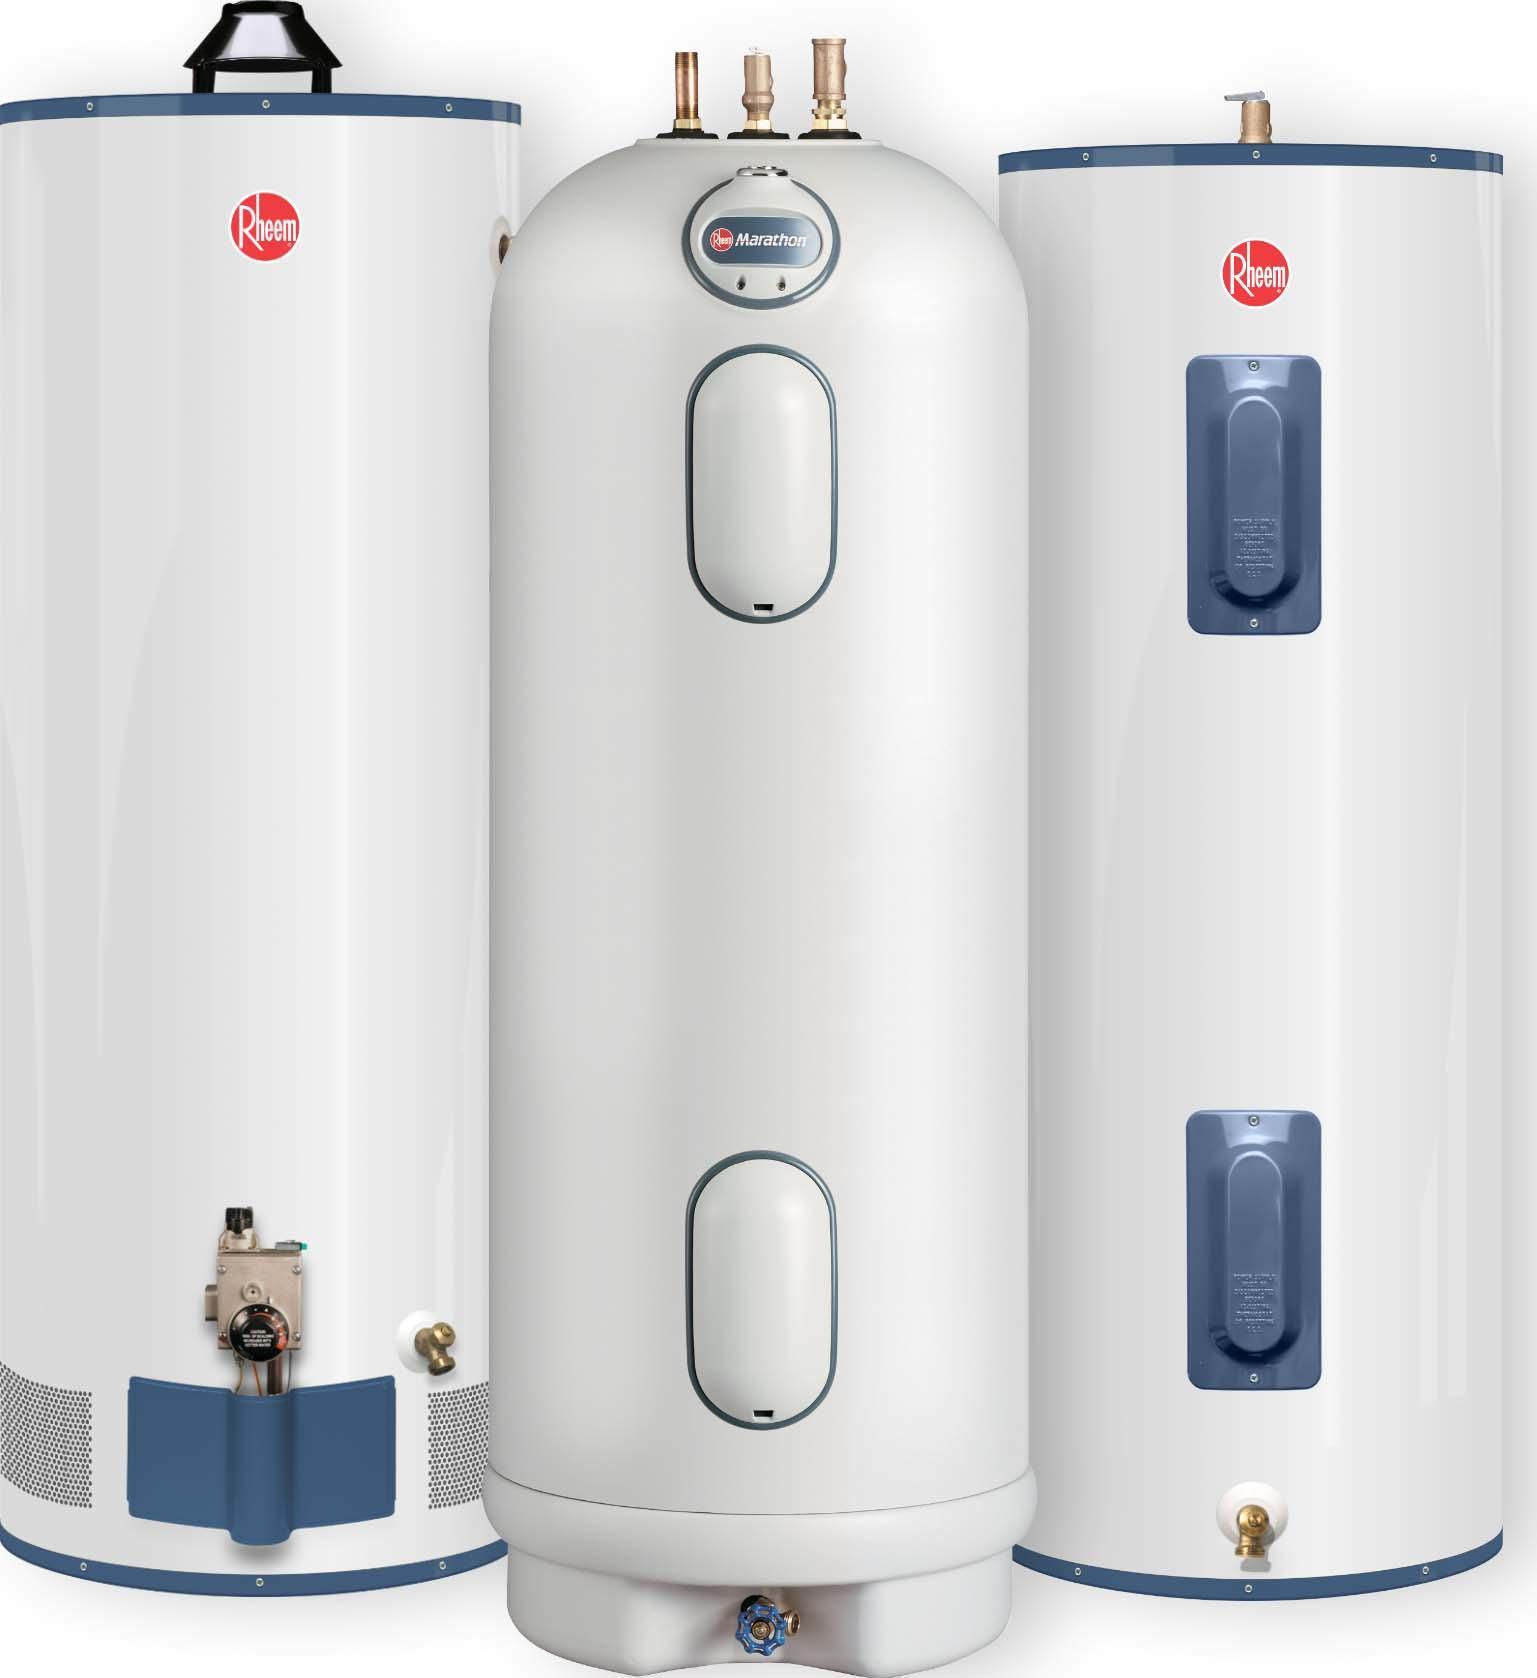 Hot Water Tank Installation Hot Water Heater Hot Water Heater Installation Coral Springs